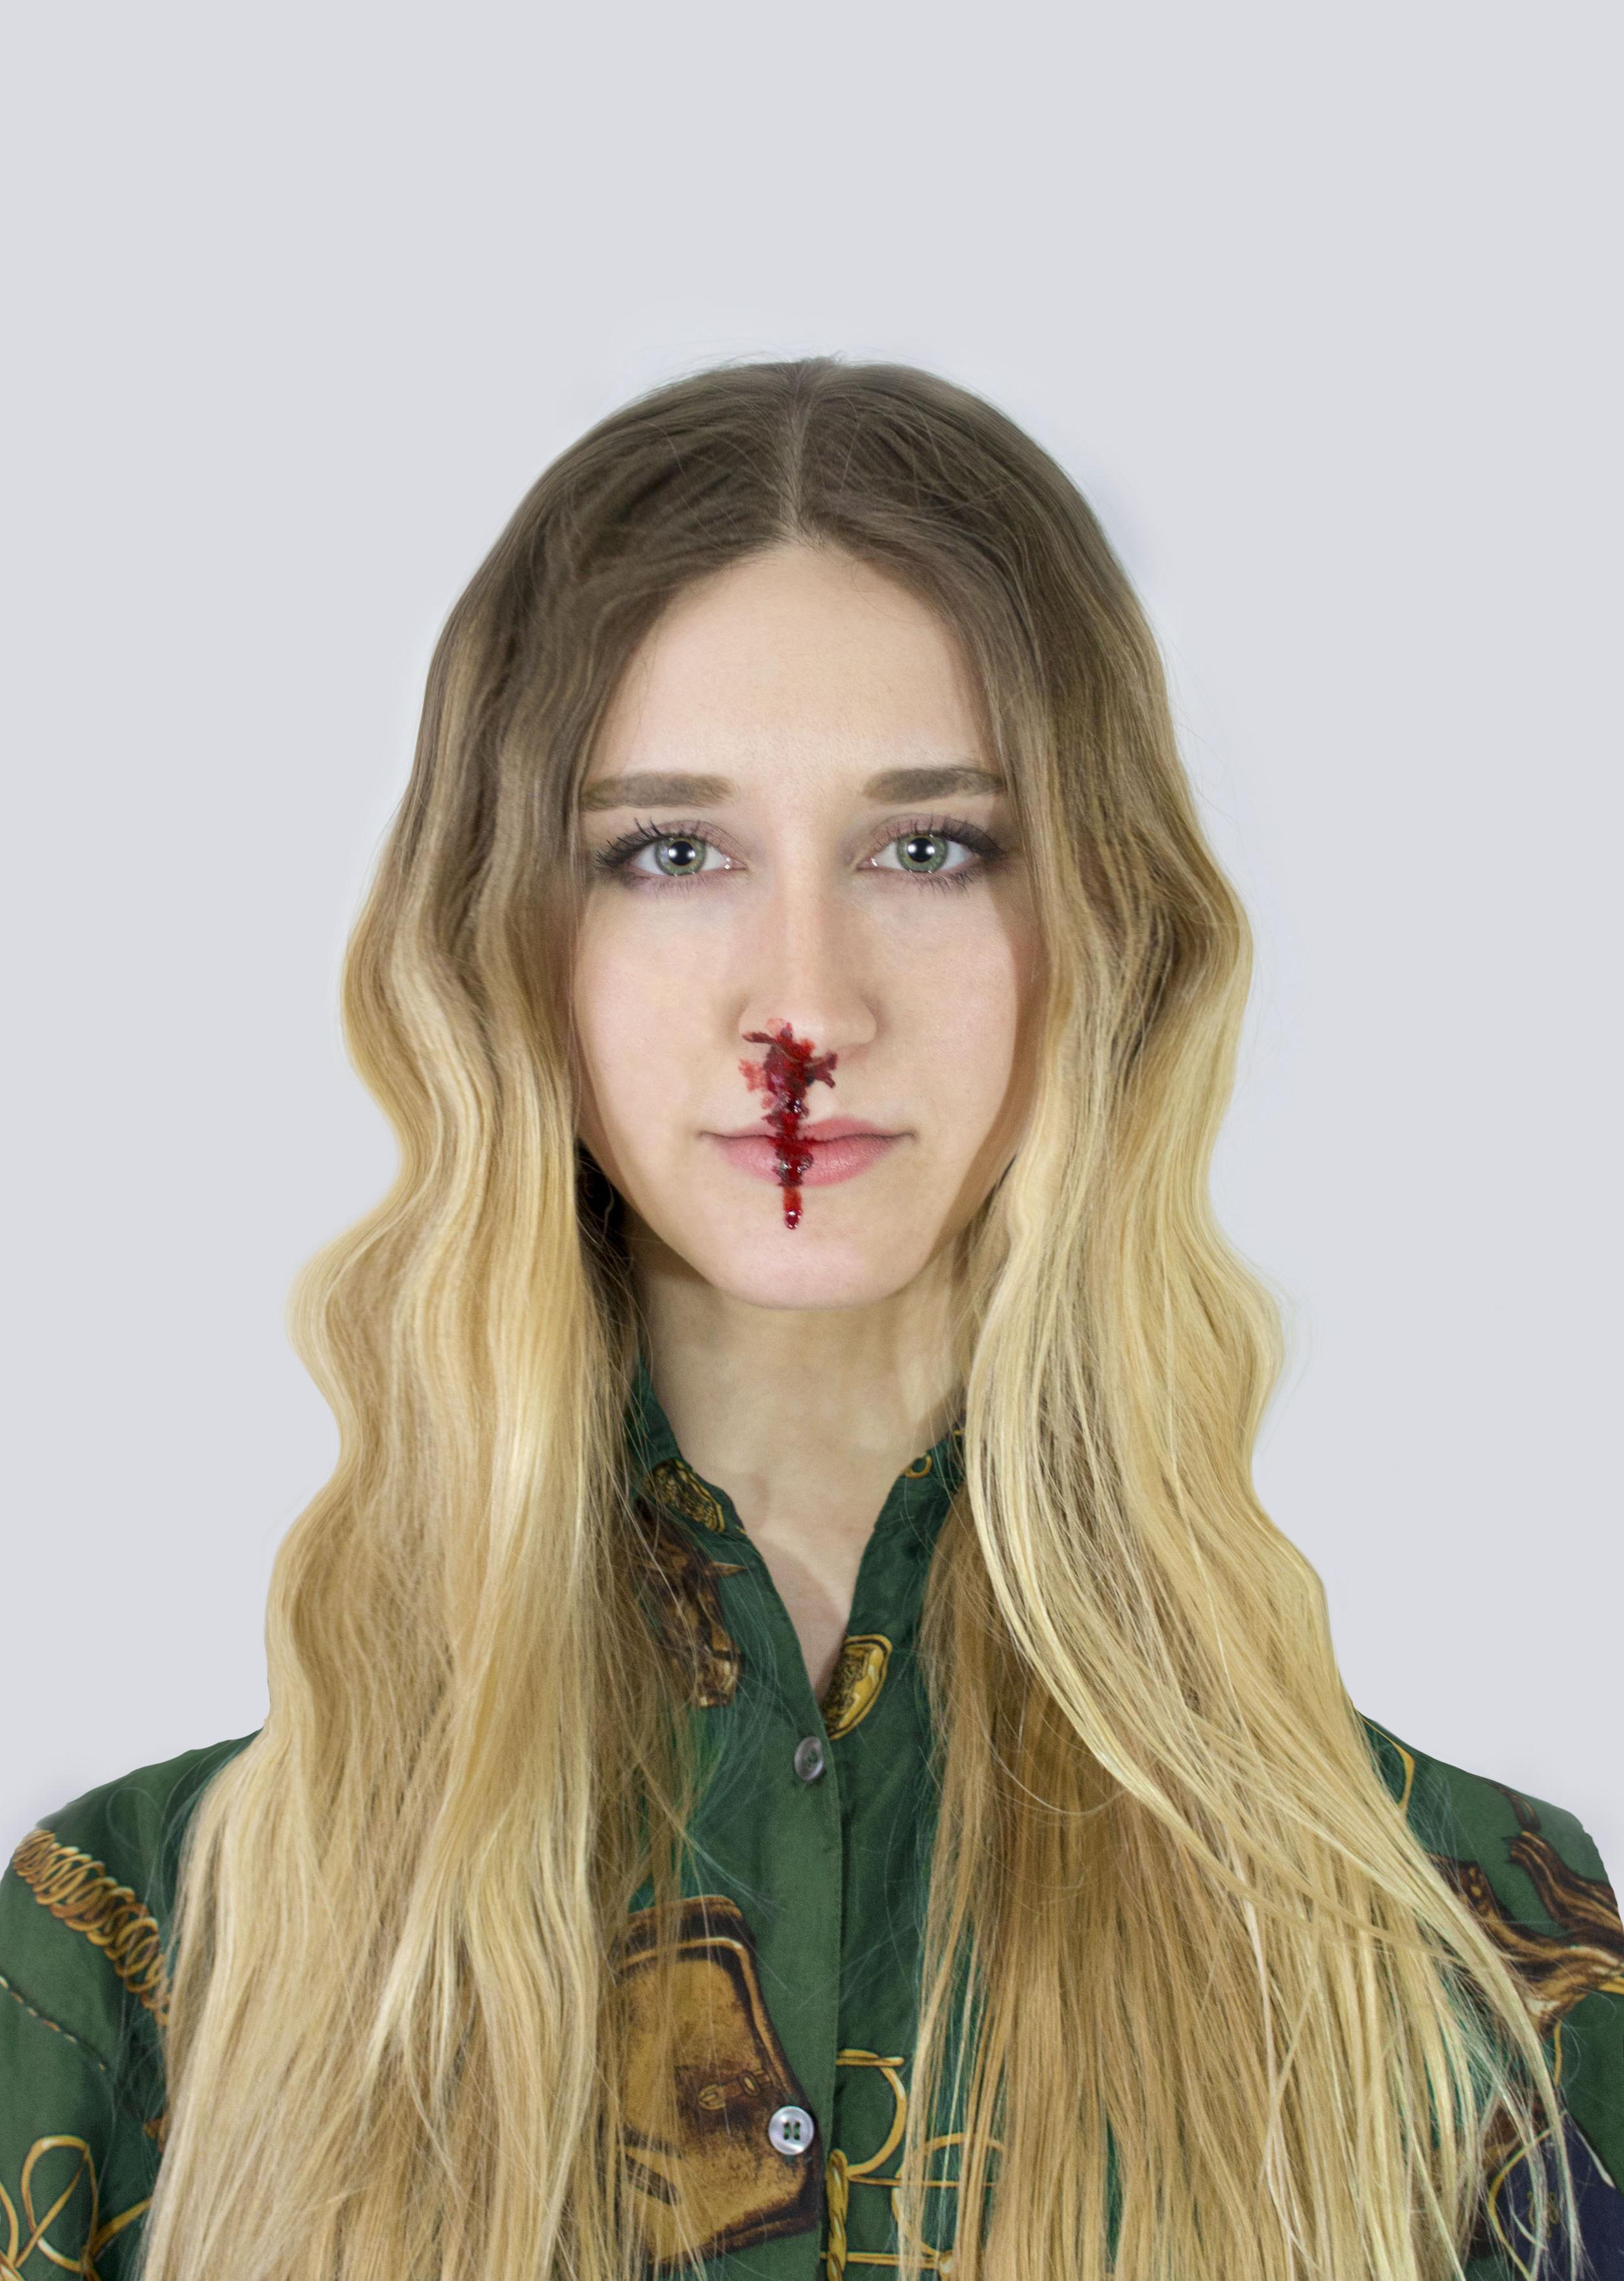 bloodycass copy.jpg